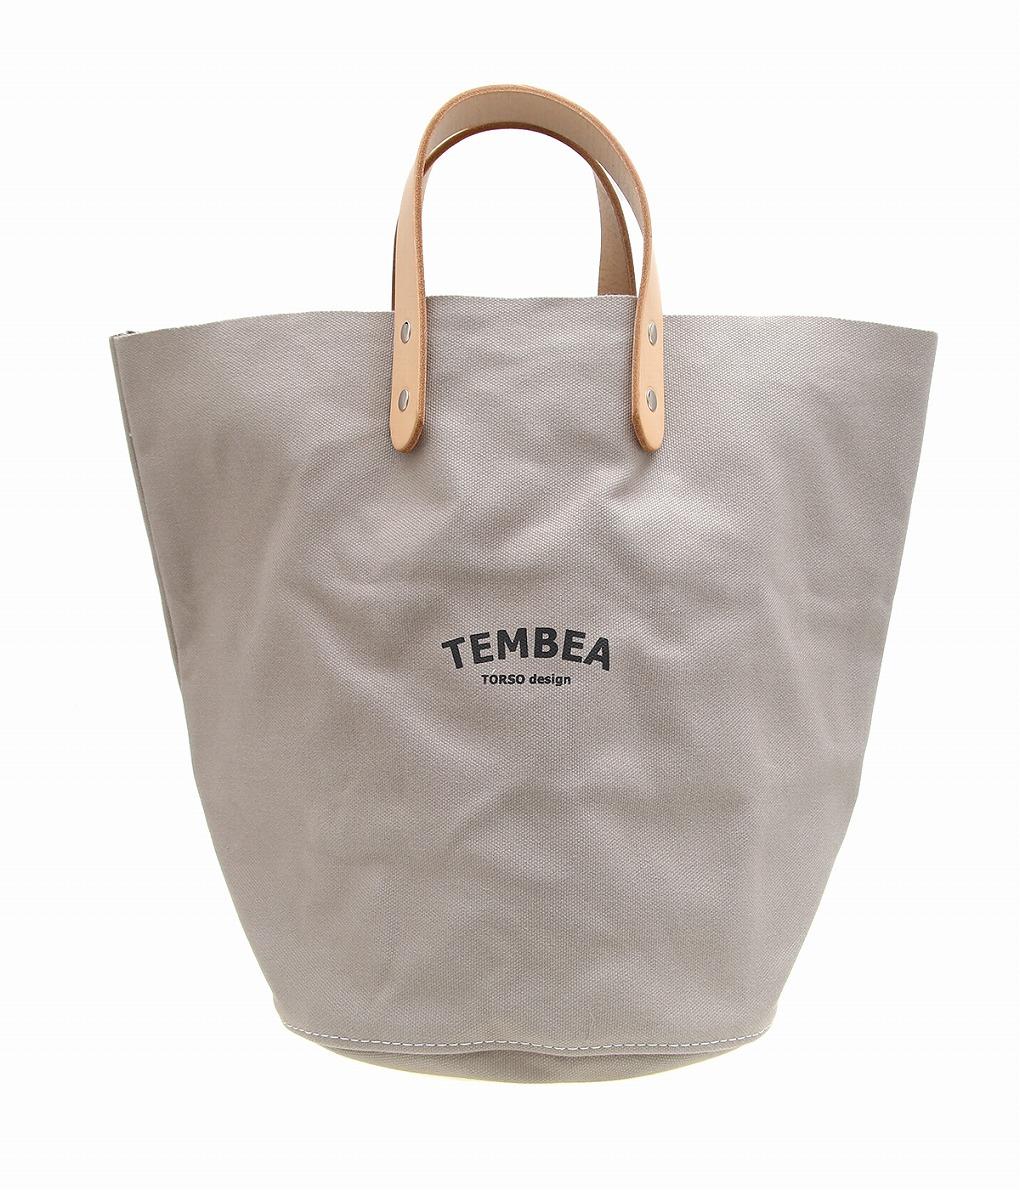 TEMBEA / テンベア : DELIVERY TOTE LOGO : デリバリー トート ロゴ : TMB-1121N 【DEA】